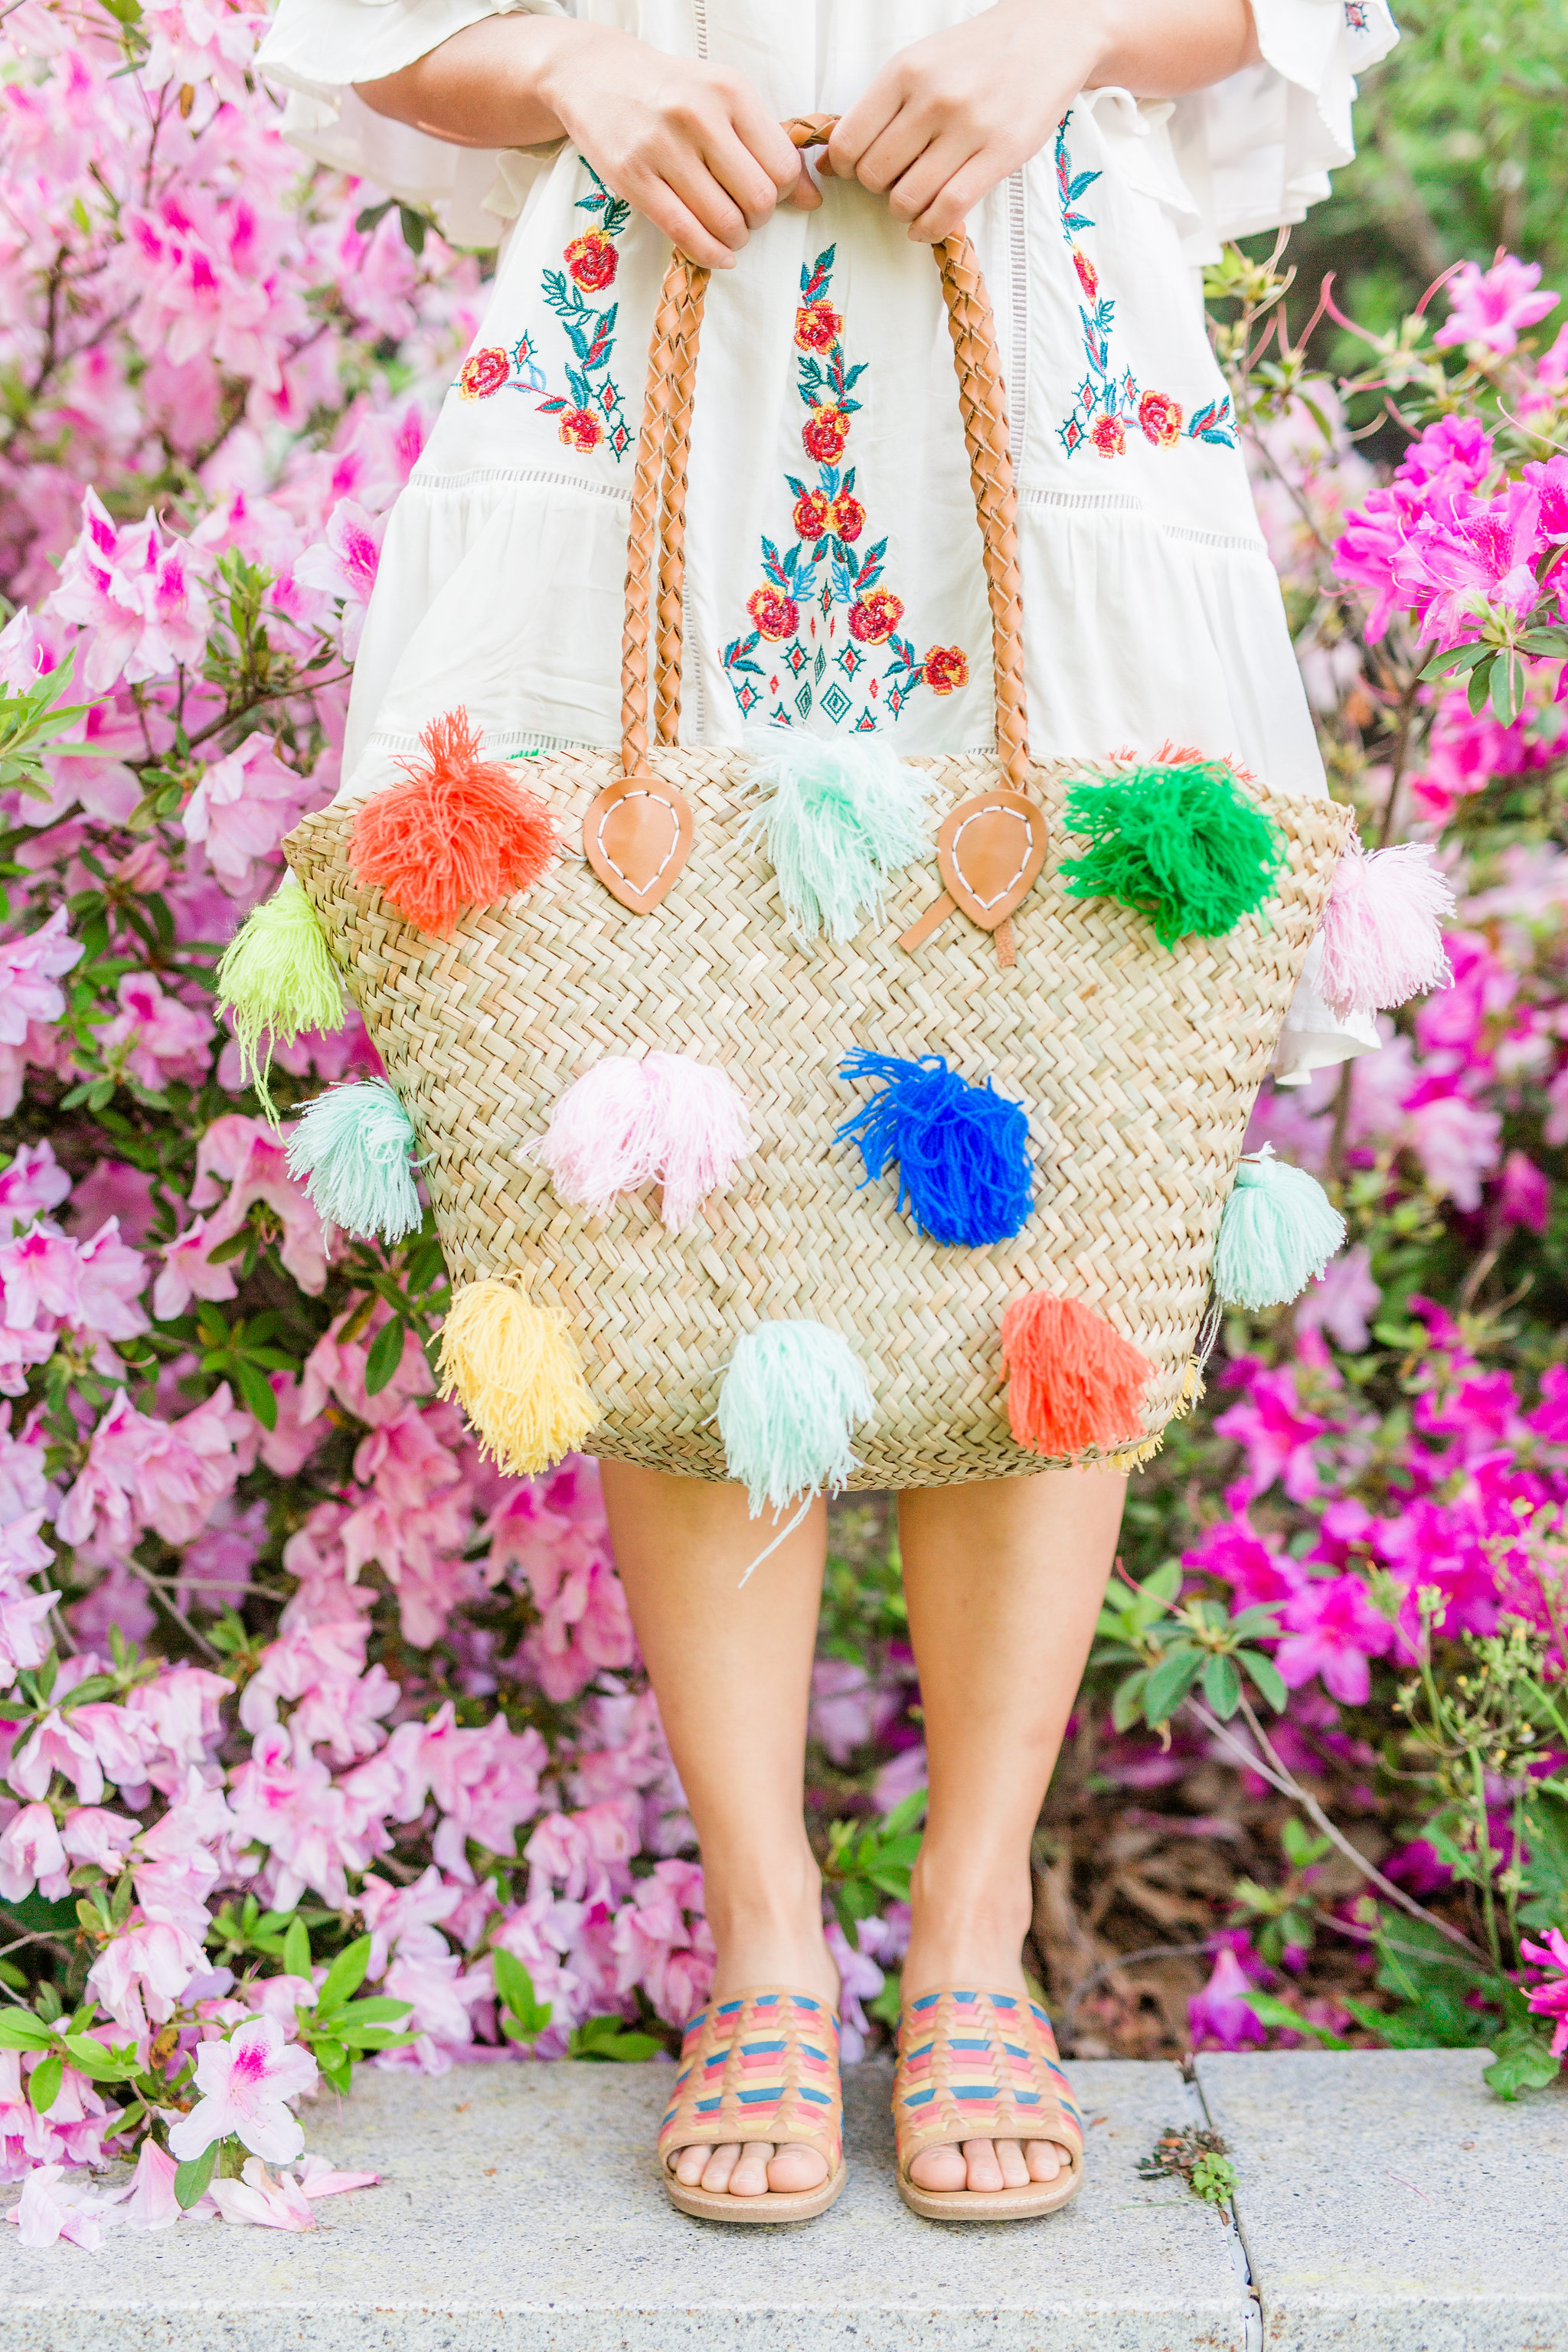 Joyfullygreen Comfortiva Brileigh Houston Azalea Trail Photoshoot. Pom Pom bag rainbow sandals.jpg